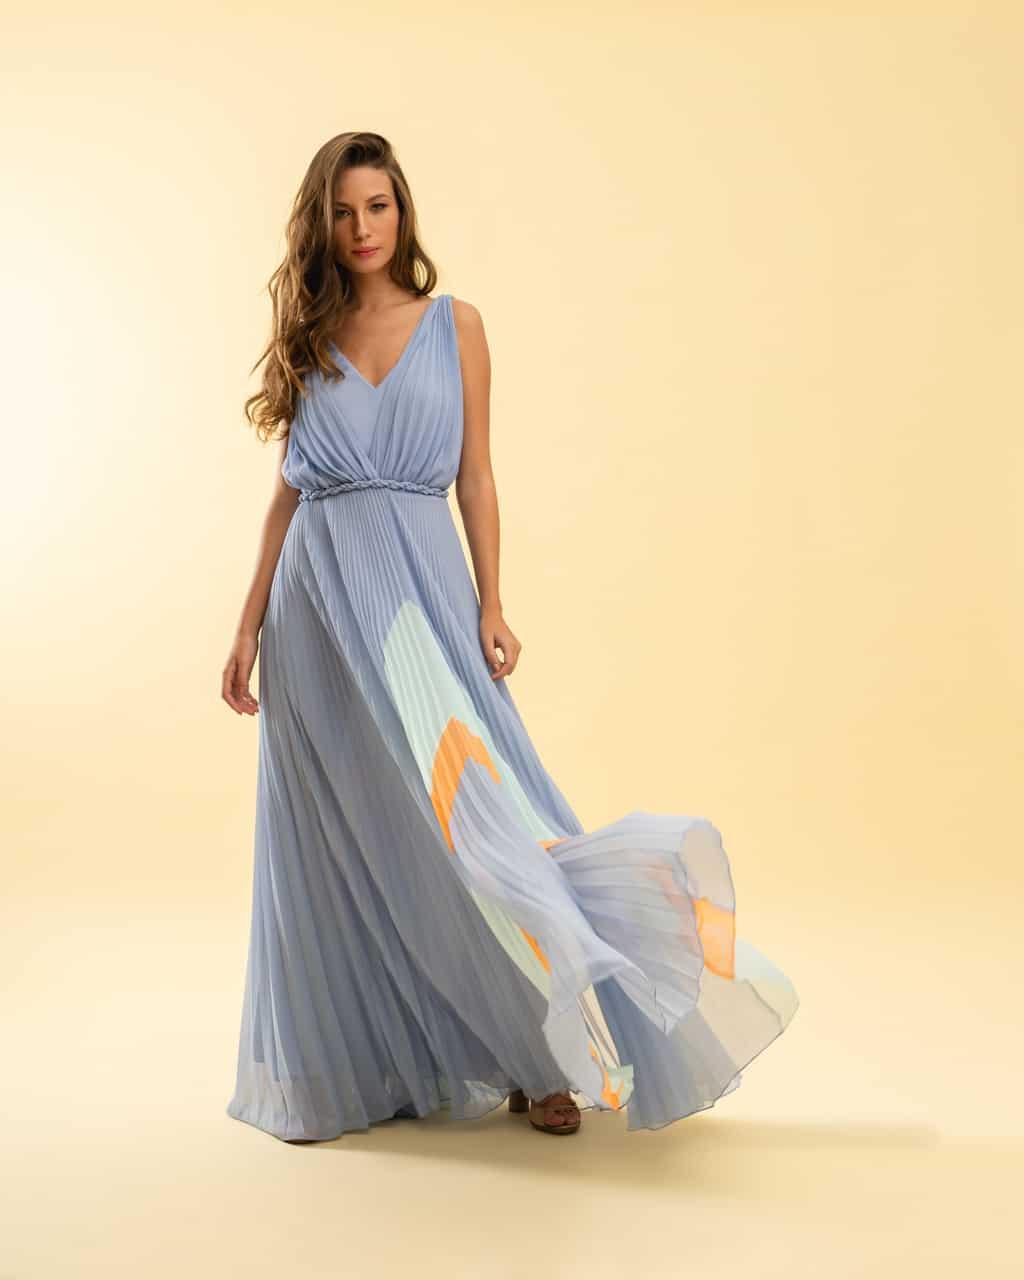 Vestido-Helena_1_Colecao_Reflexos_Julia_Golldenzon_Foto_de_Patrick_Villela